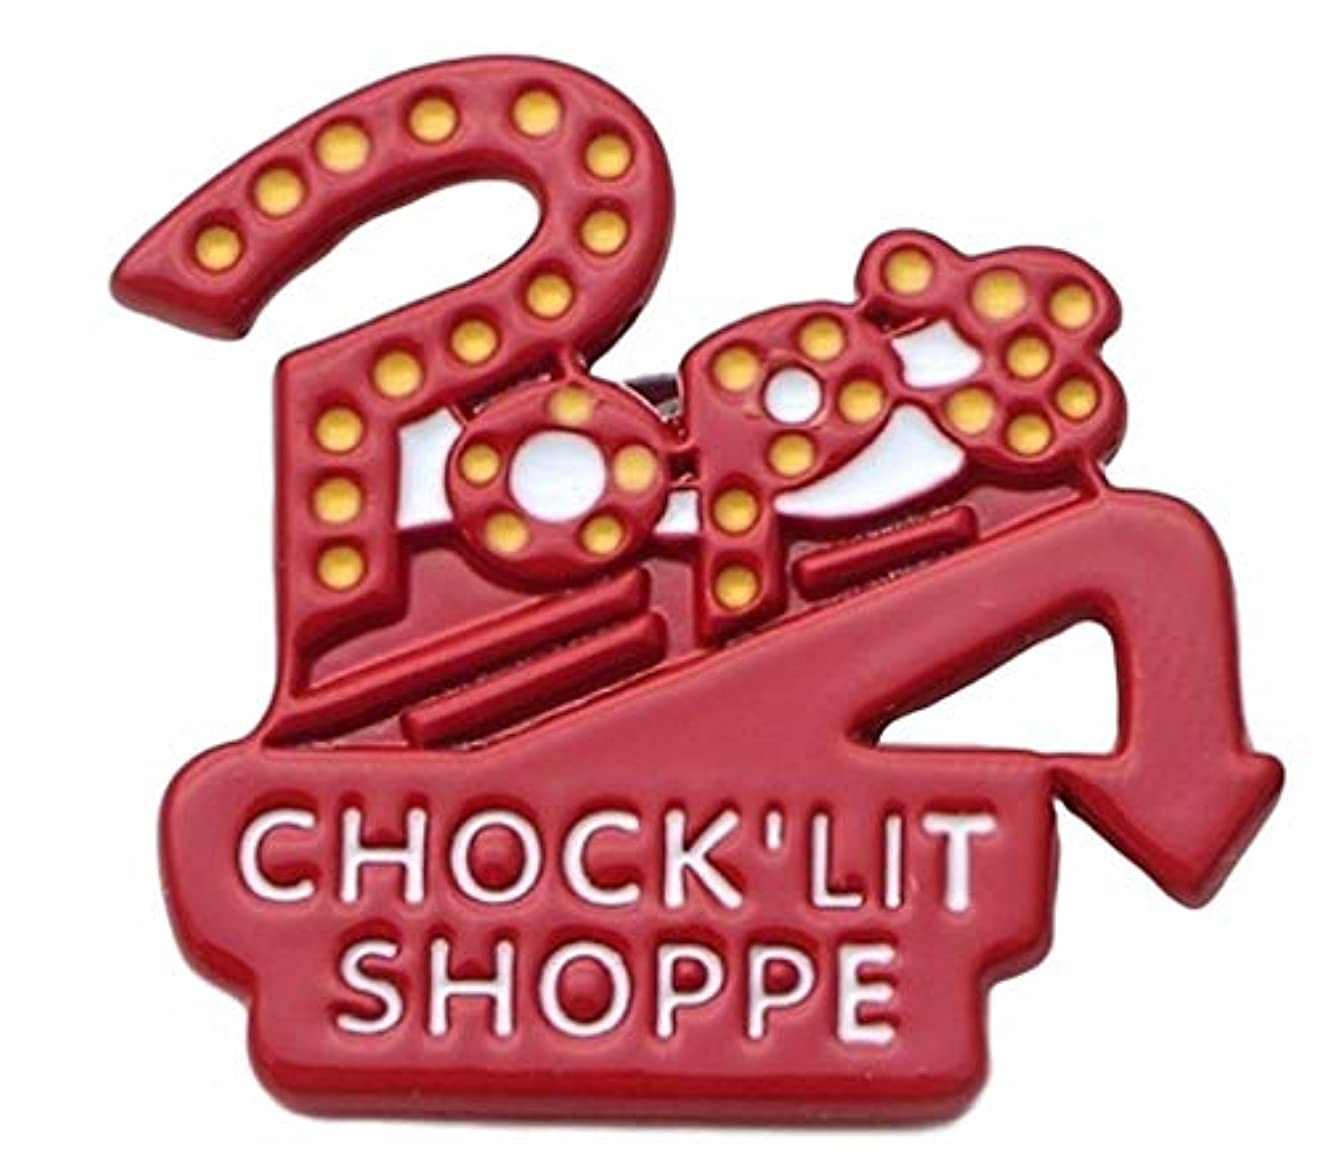 New Horizons Production Riverdale Pop's Chock'lit Shoppe Metal 1 1/4